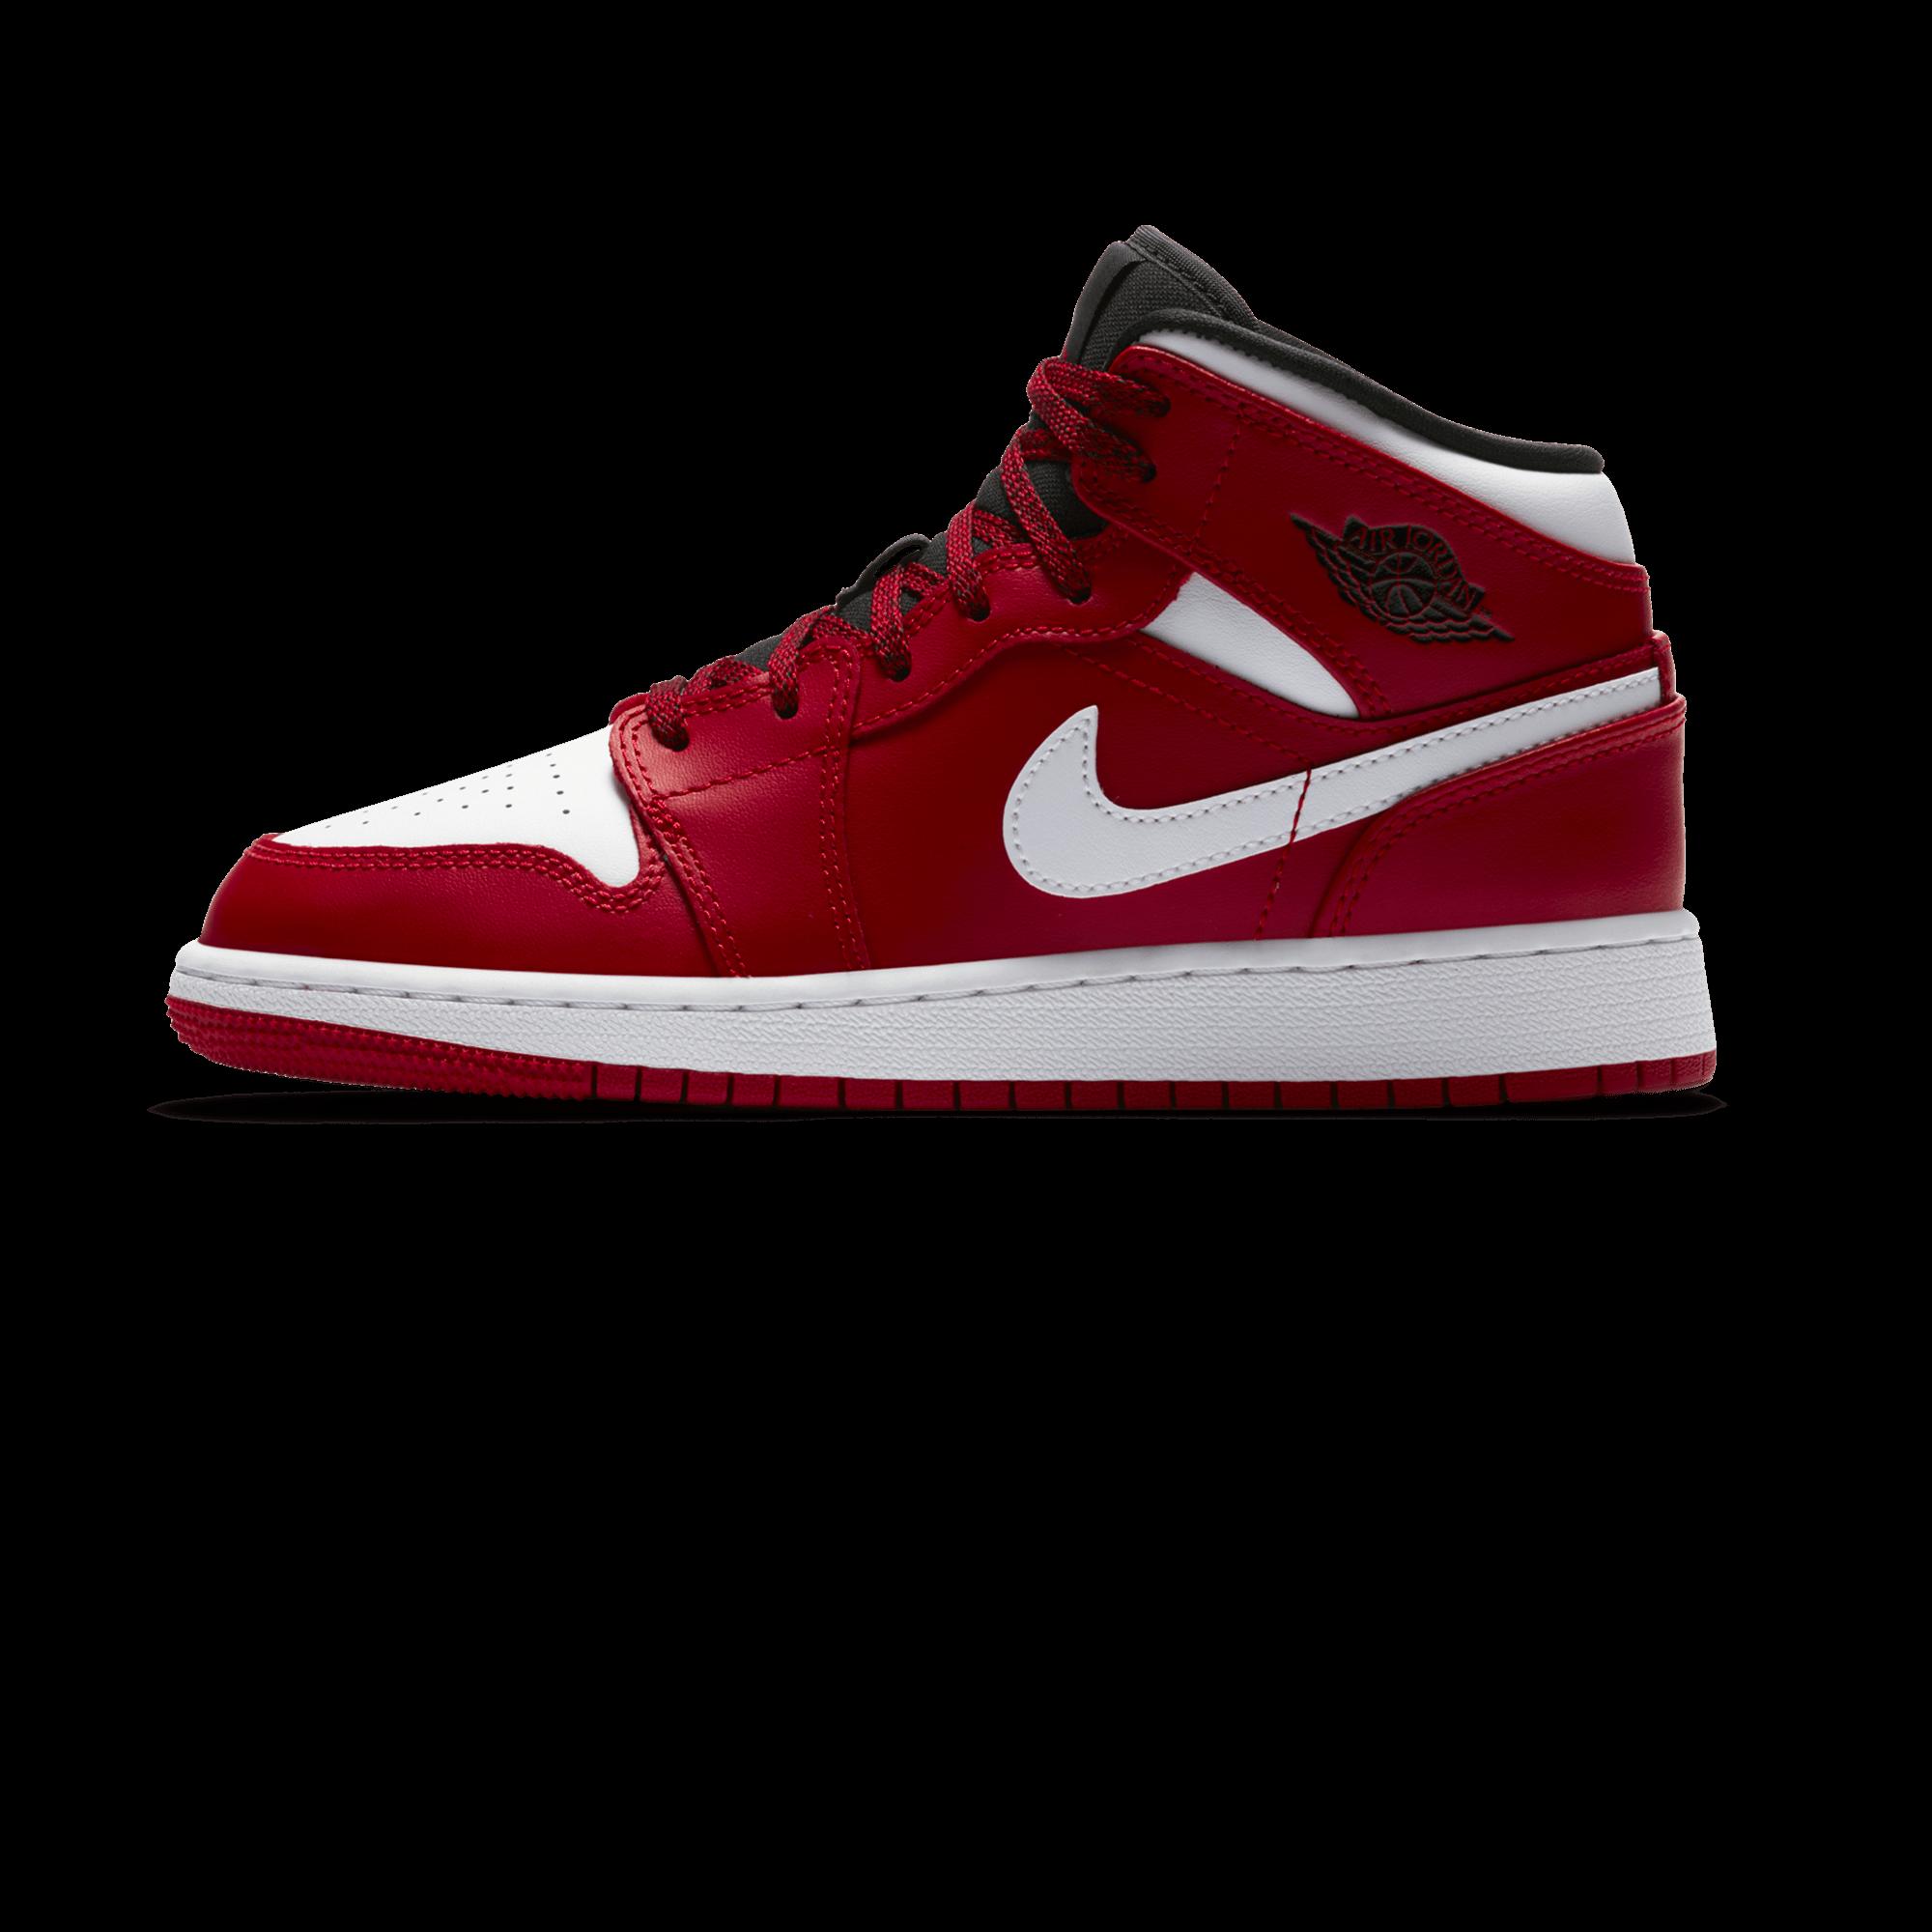 separation shoes 06faf 40497 Air Jordan 1 Mid GS gym red / white / black - Kids | Holypopstore.com